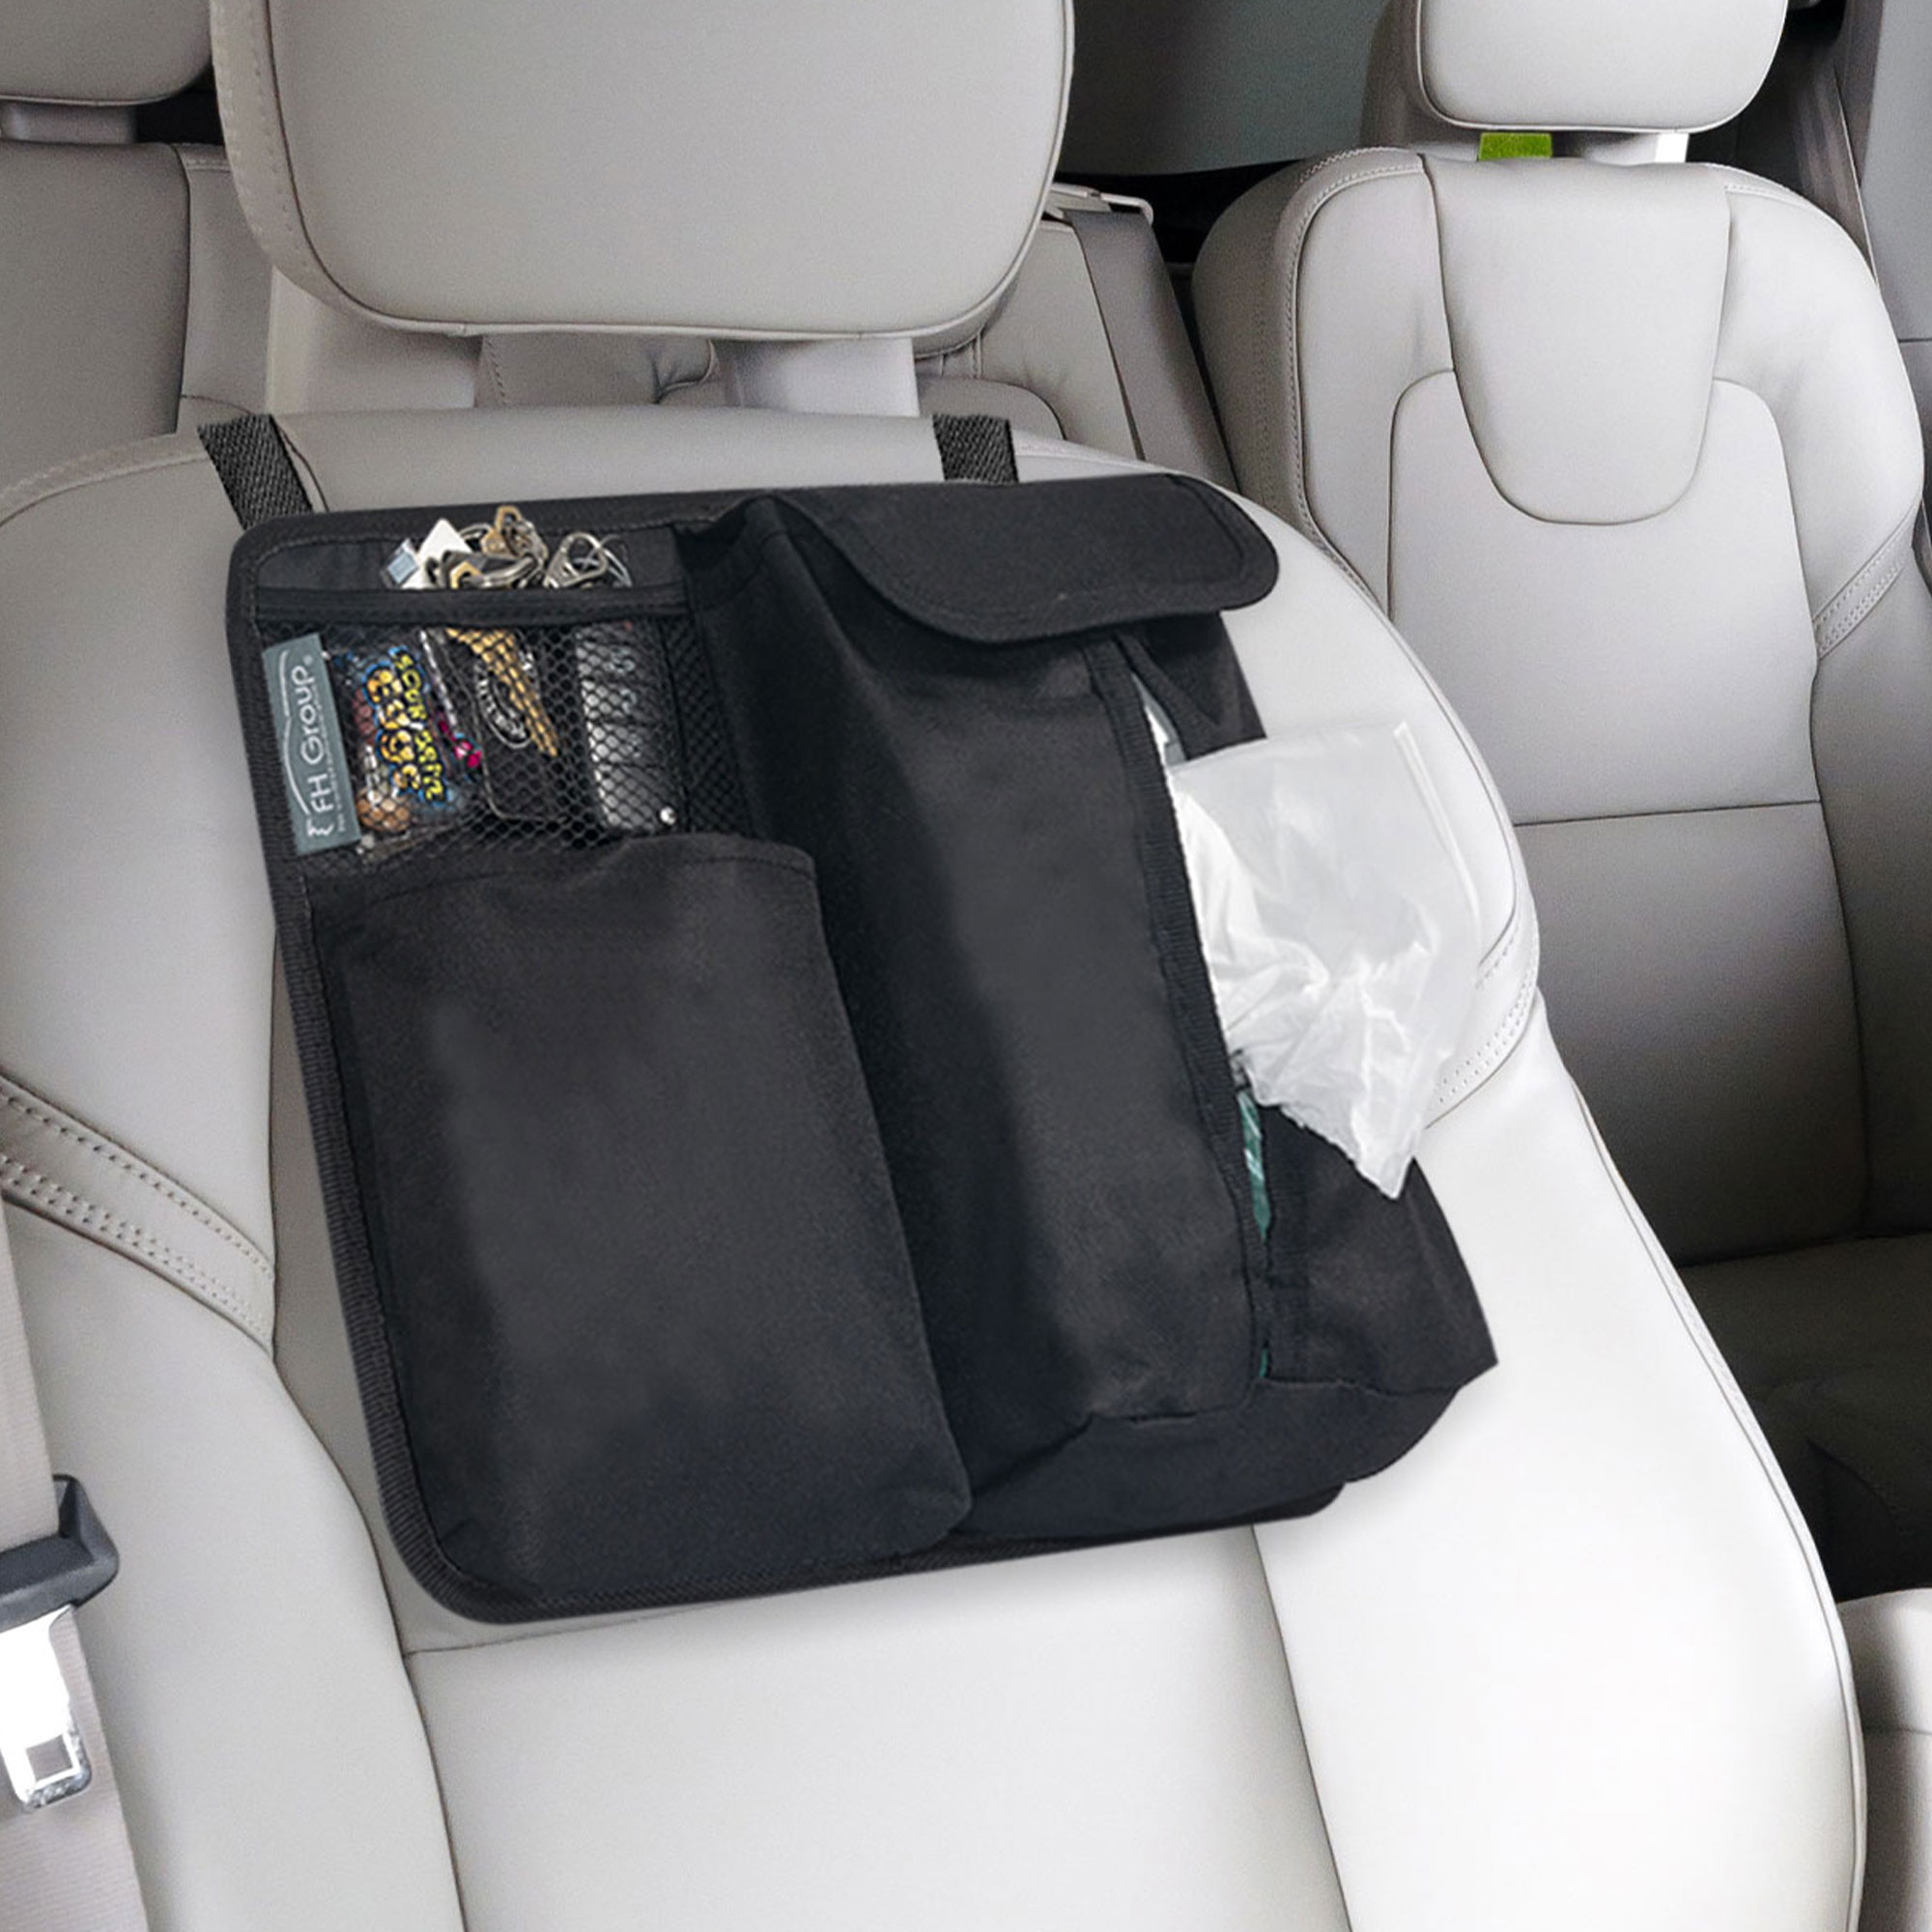 fh1136 black car organizer tissue dispenser